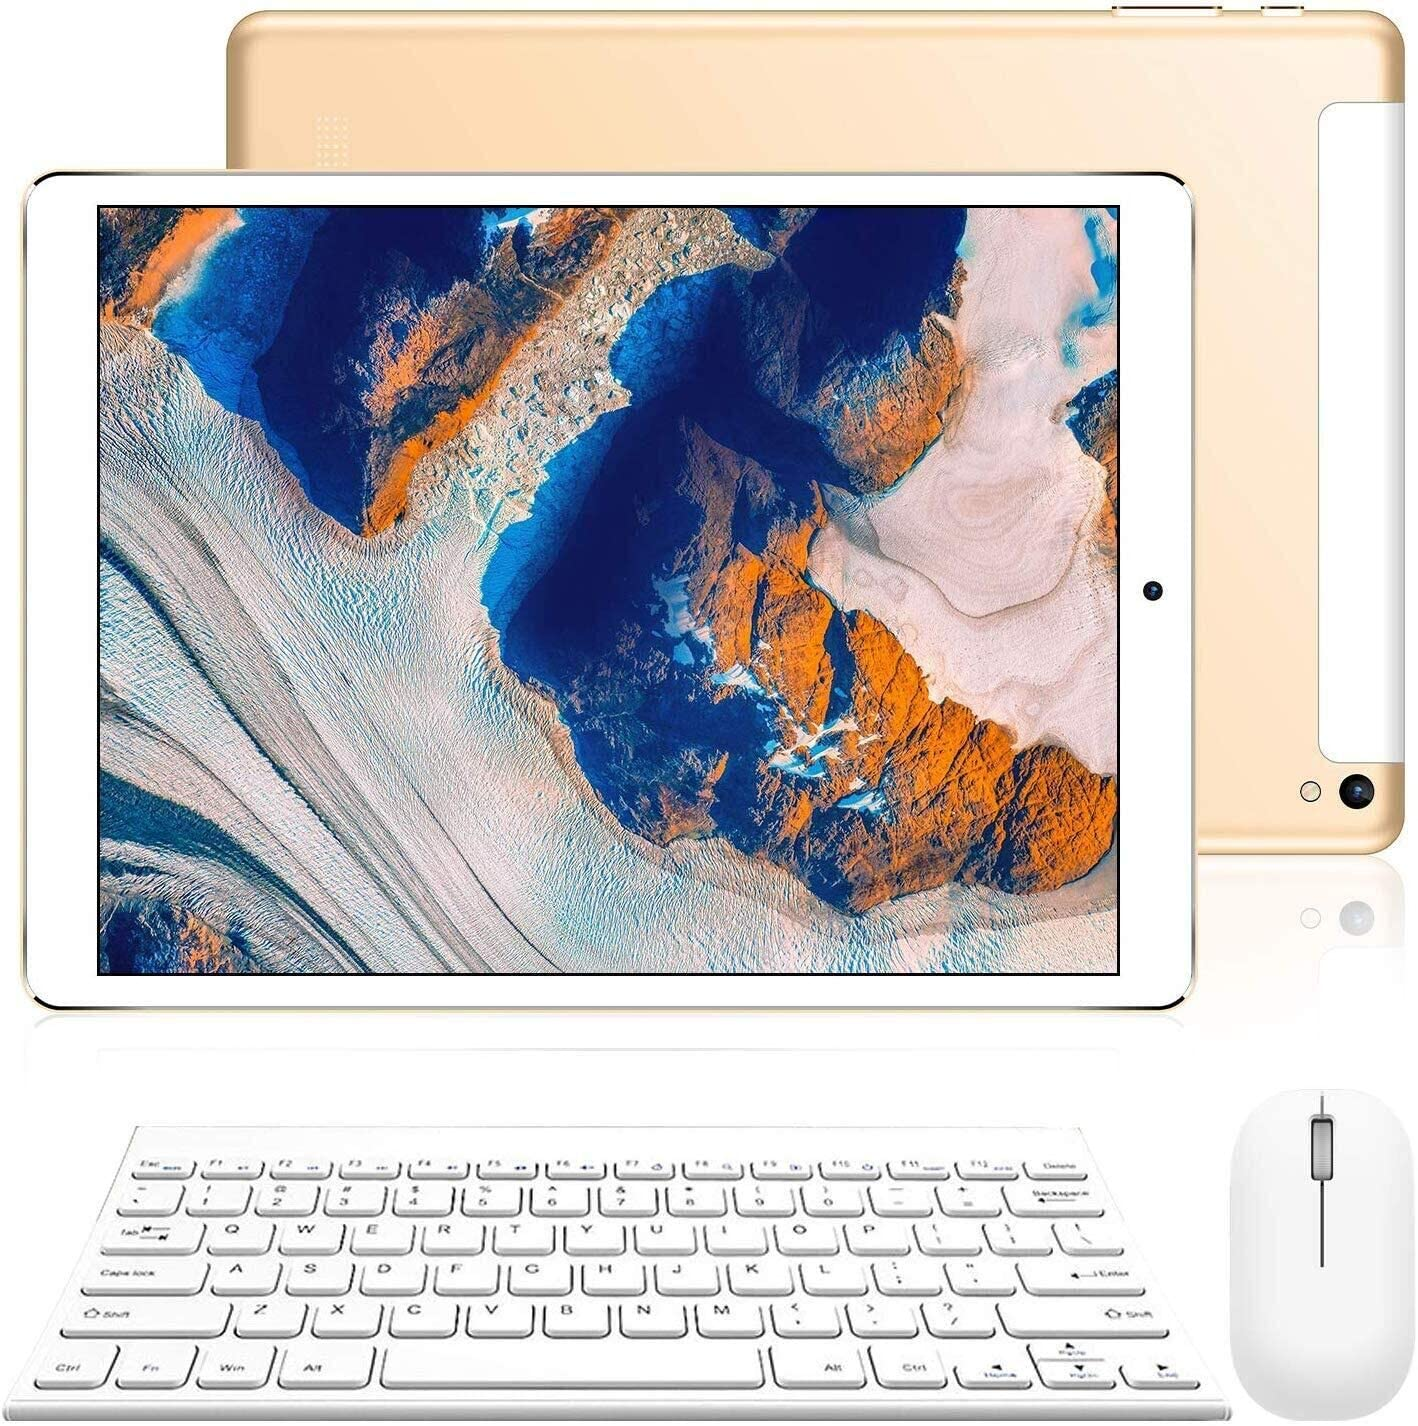 Tablet 10 Pulgadas Android 9.0 Ultrar-Rápido Tablets 3 GB RAM 32 GB/128GB ROM 4G Dual SIM/WiFi 8500mAh Batería Quad Core (GPS, Bluetooth, OTG, Netfilix,Type-C)-Certificación Google GMS